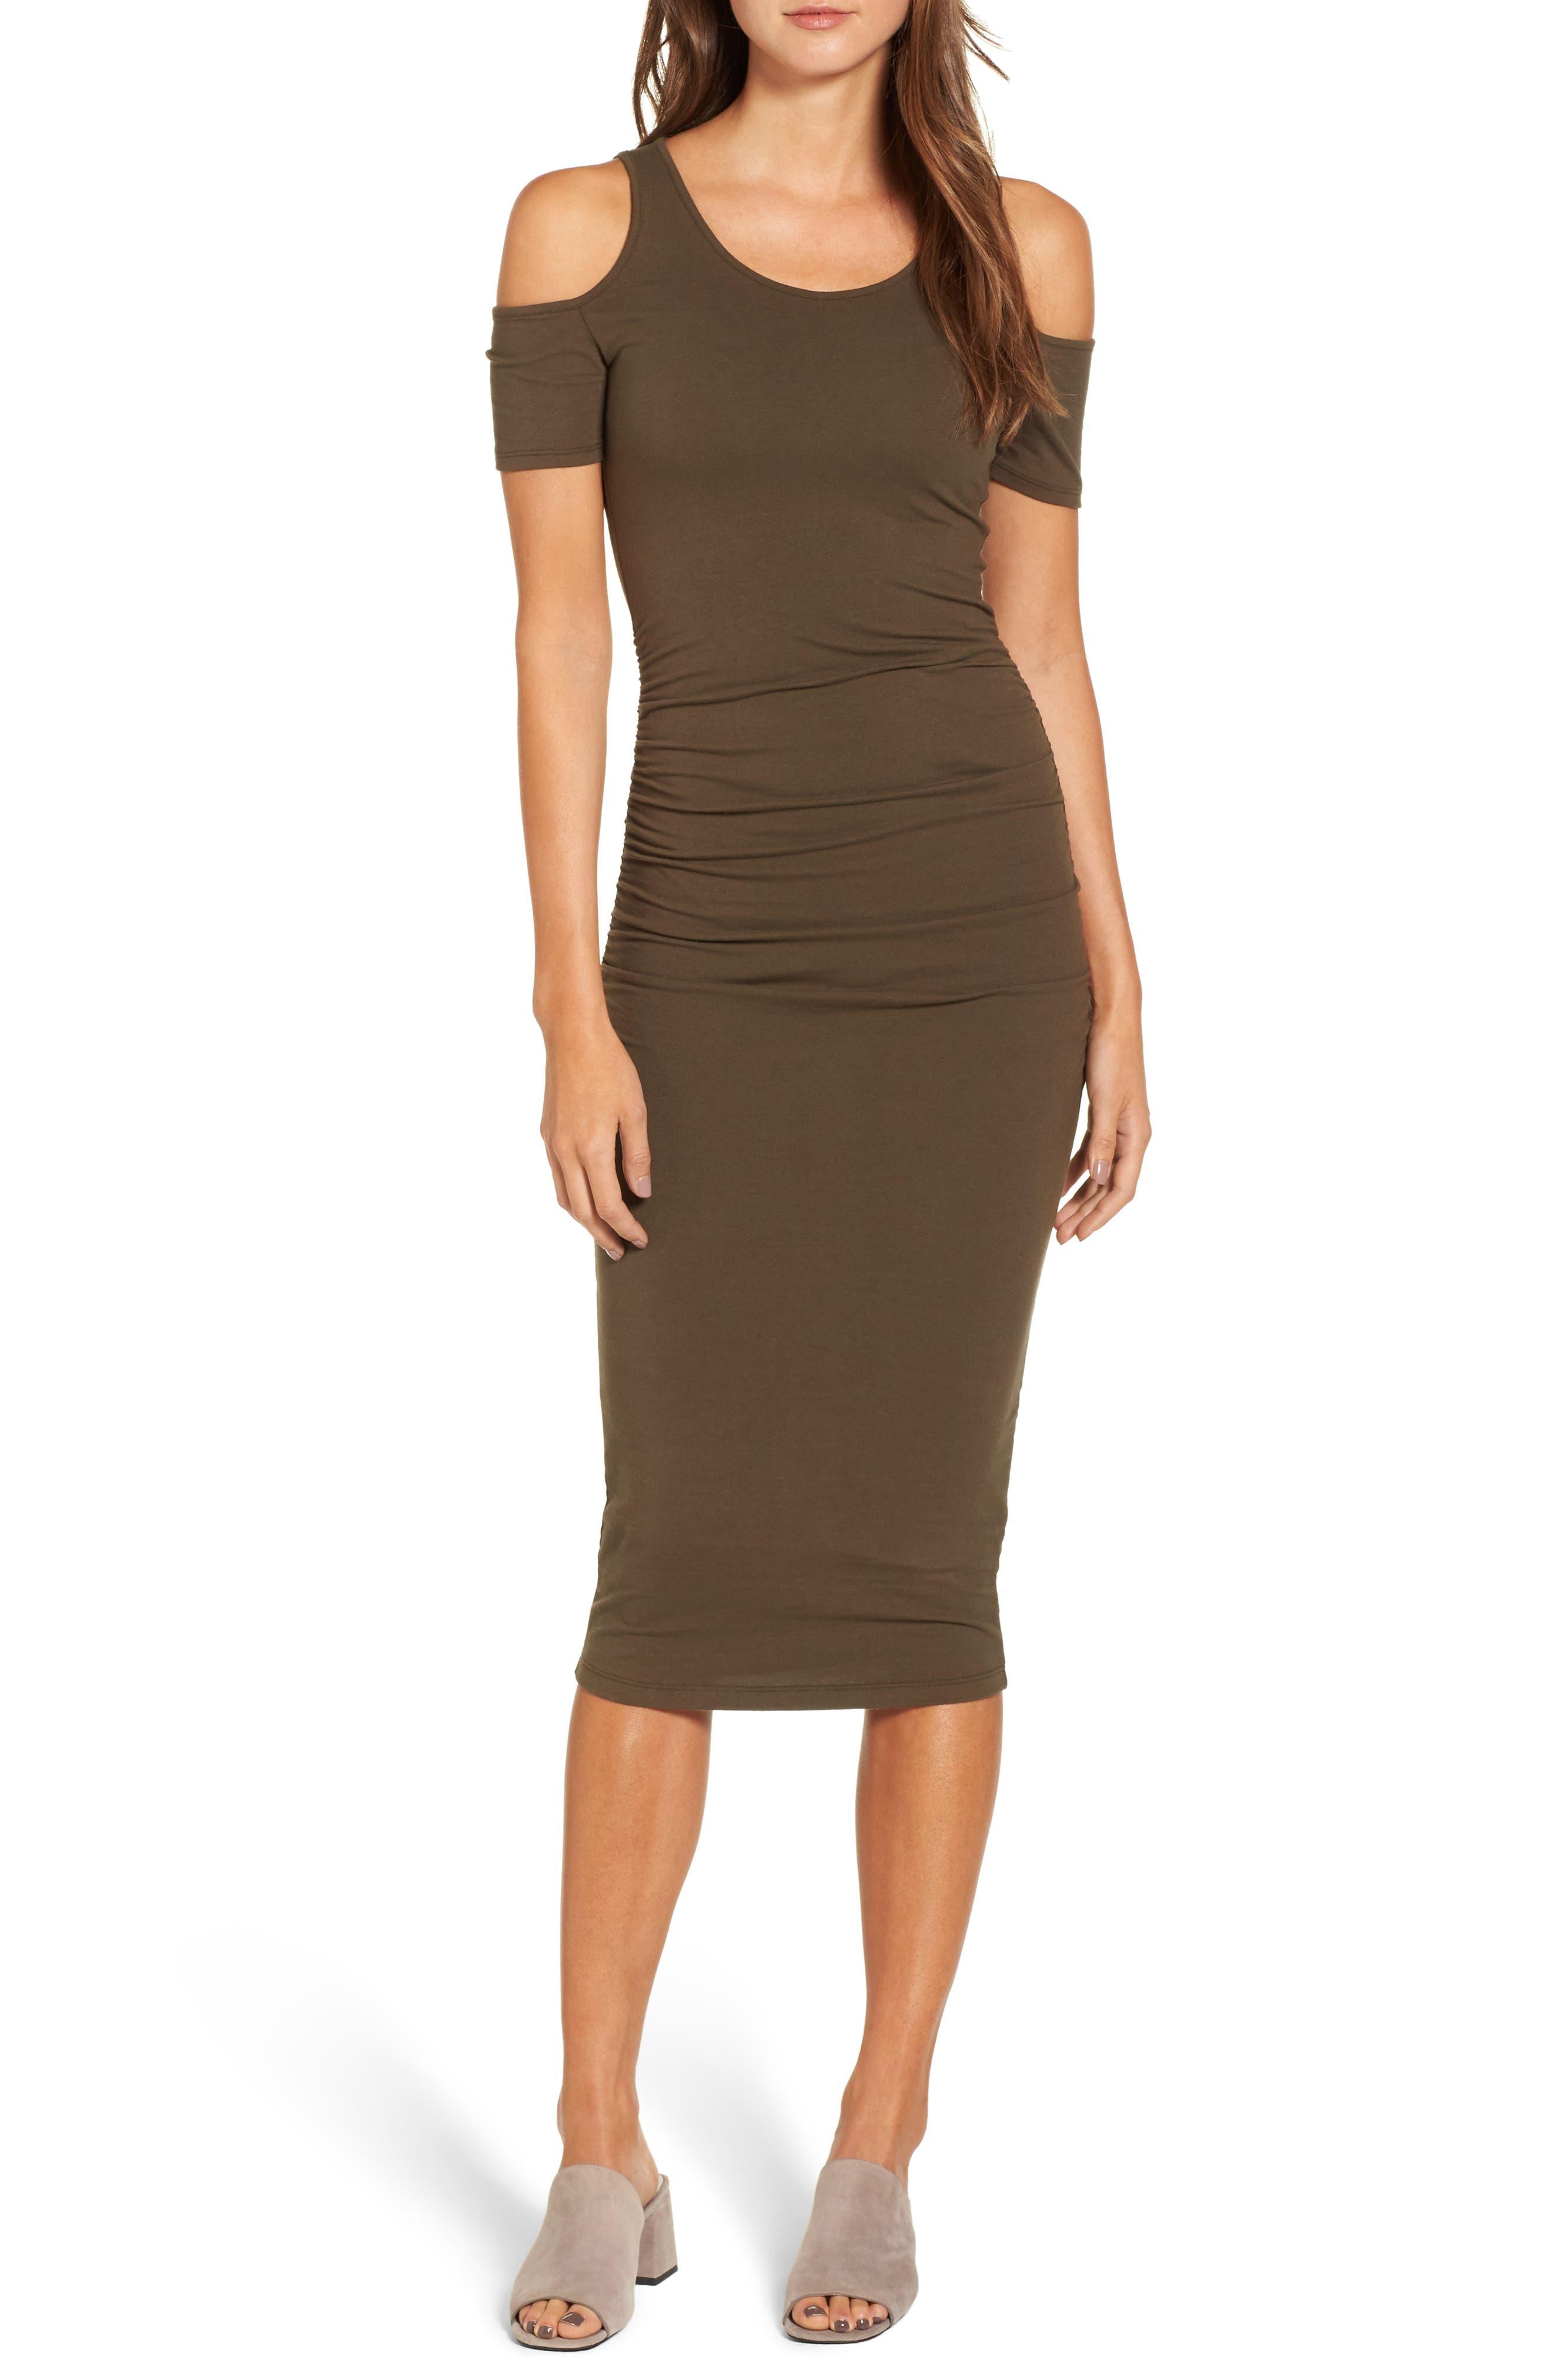 Alternate Image 1 Selected - Michael Stars Cold Shoulder Body-Con Dress (Regular & Petite)